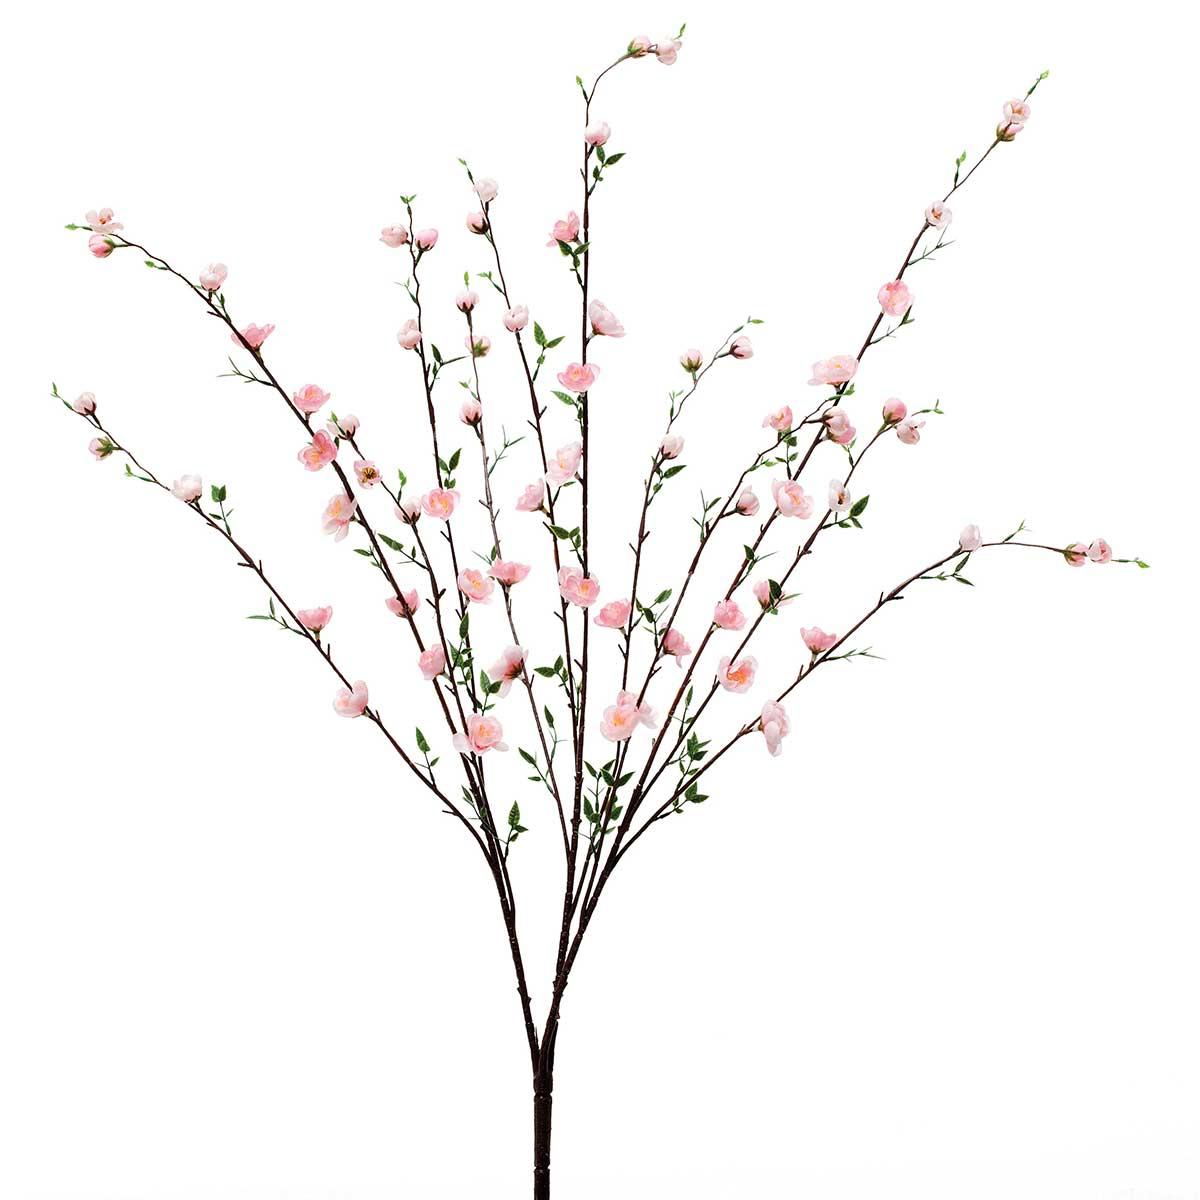 1200x1200 Petite Blossoms Meravic